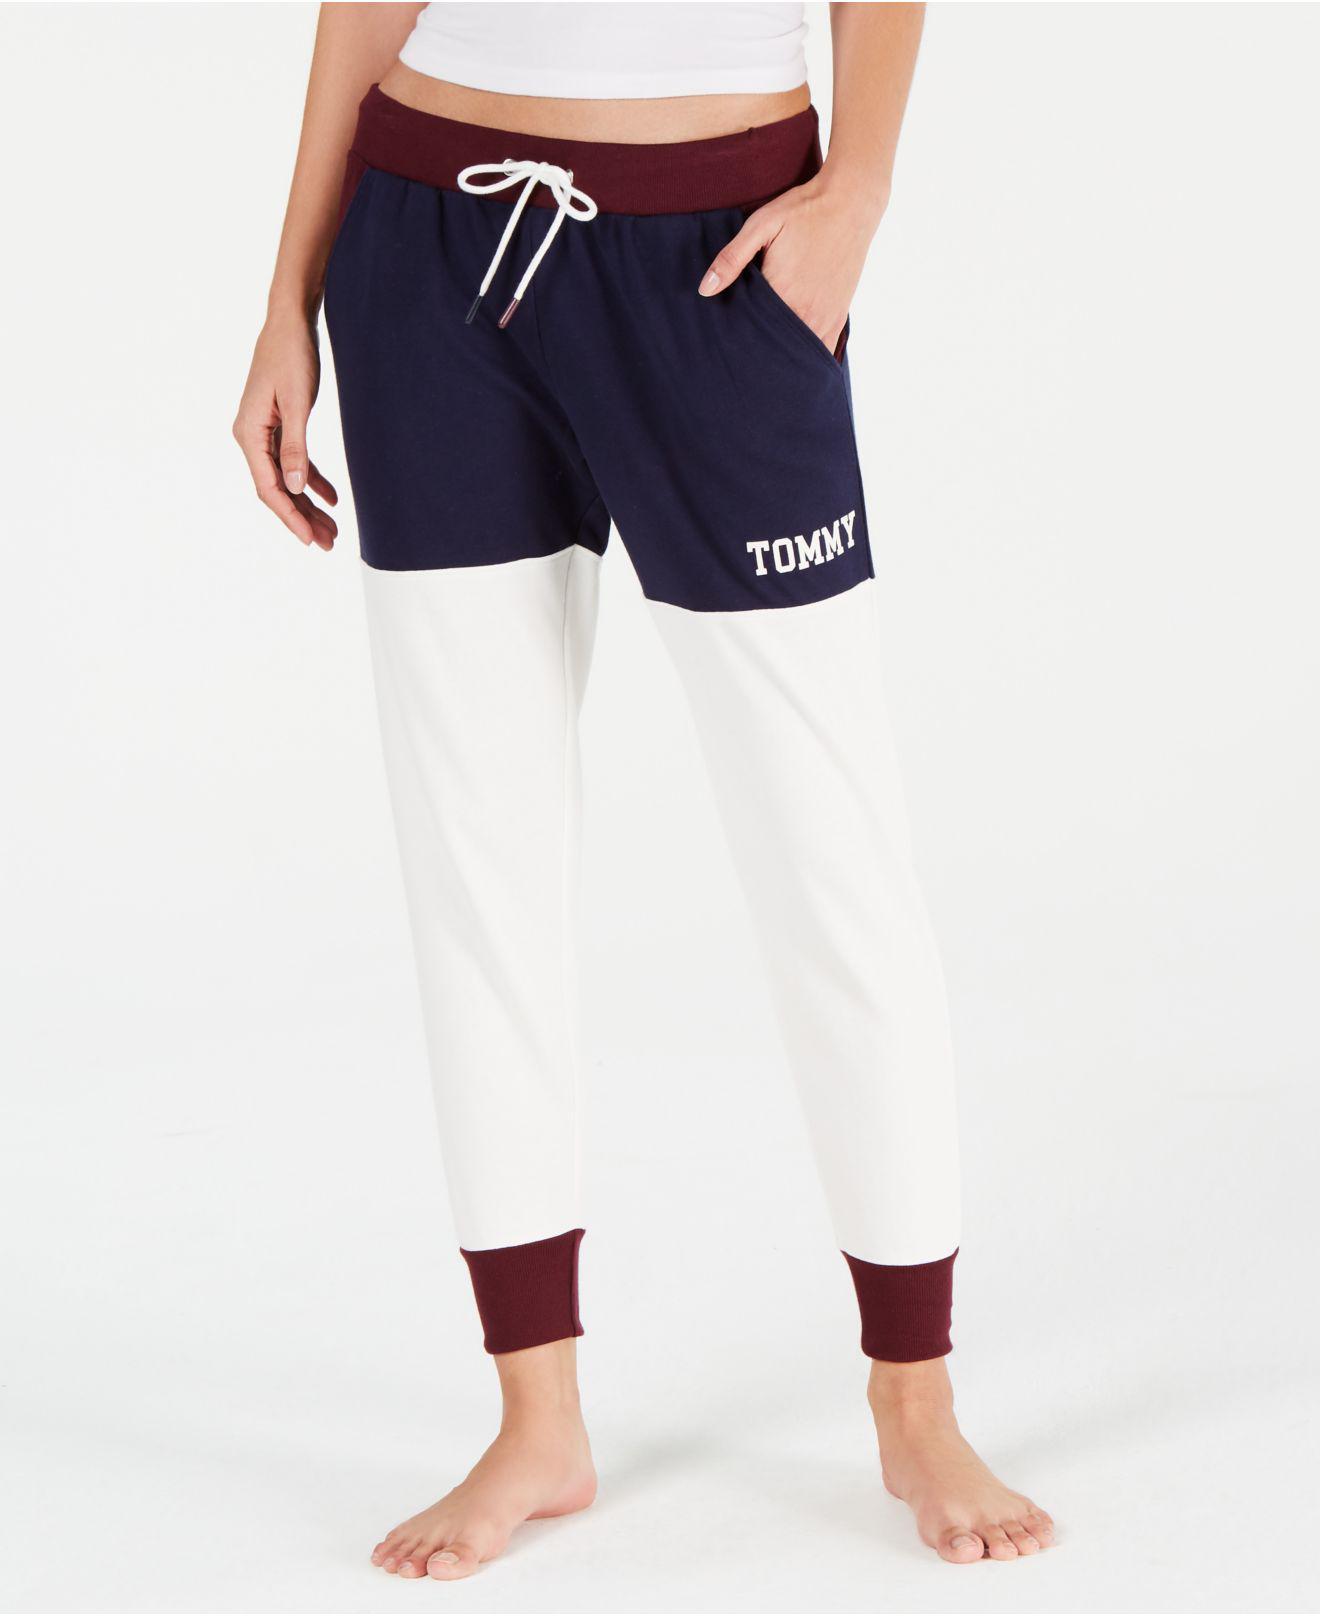 a5737397f3fd Tommy Hilfiger. Women's Blue Colorblock Logo Jogger Pajama Pants R65s077